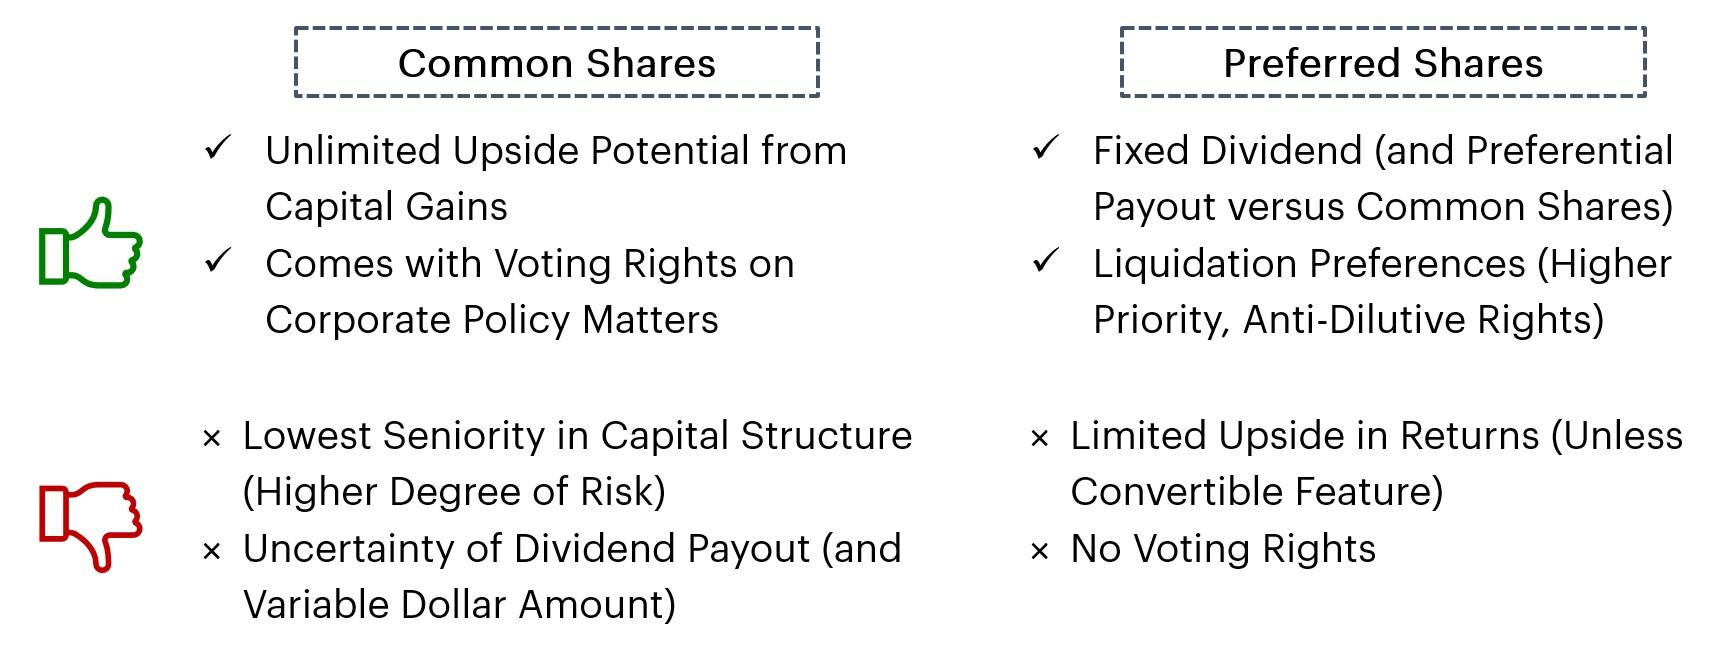 Common Shares versus Preferred Shares Summary Comparison